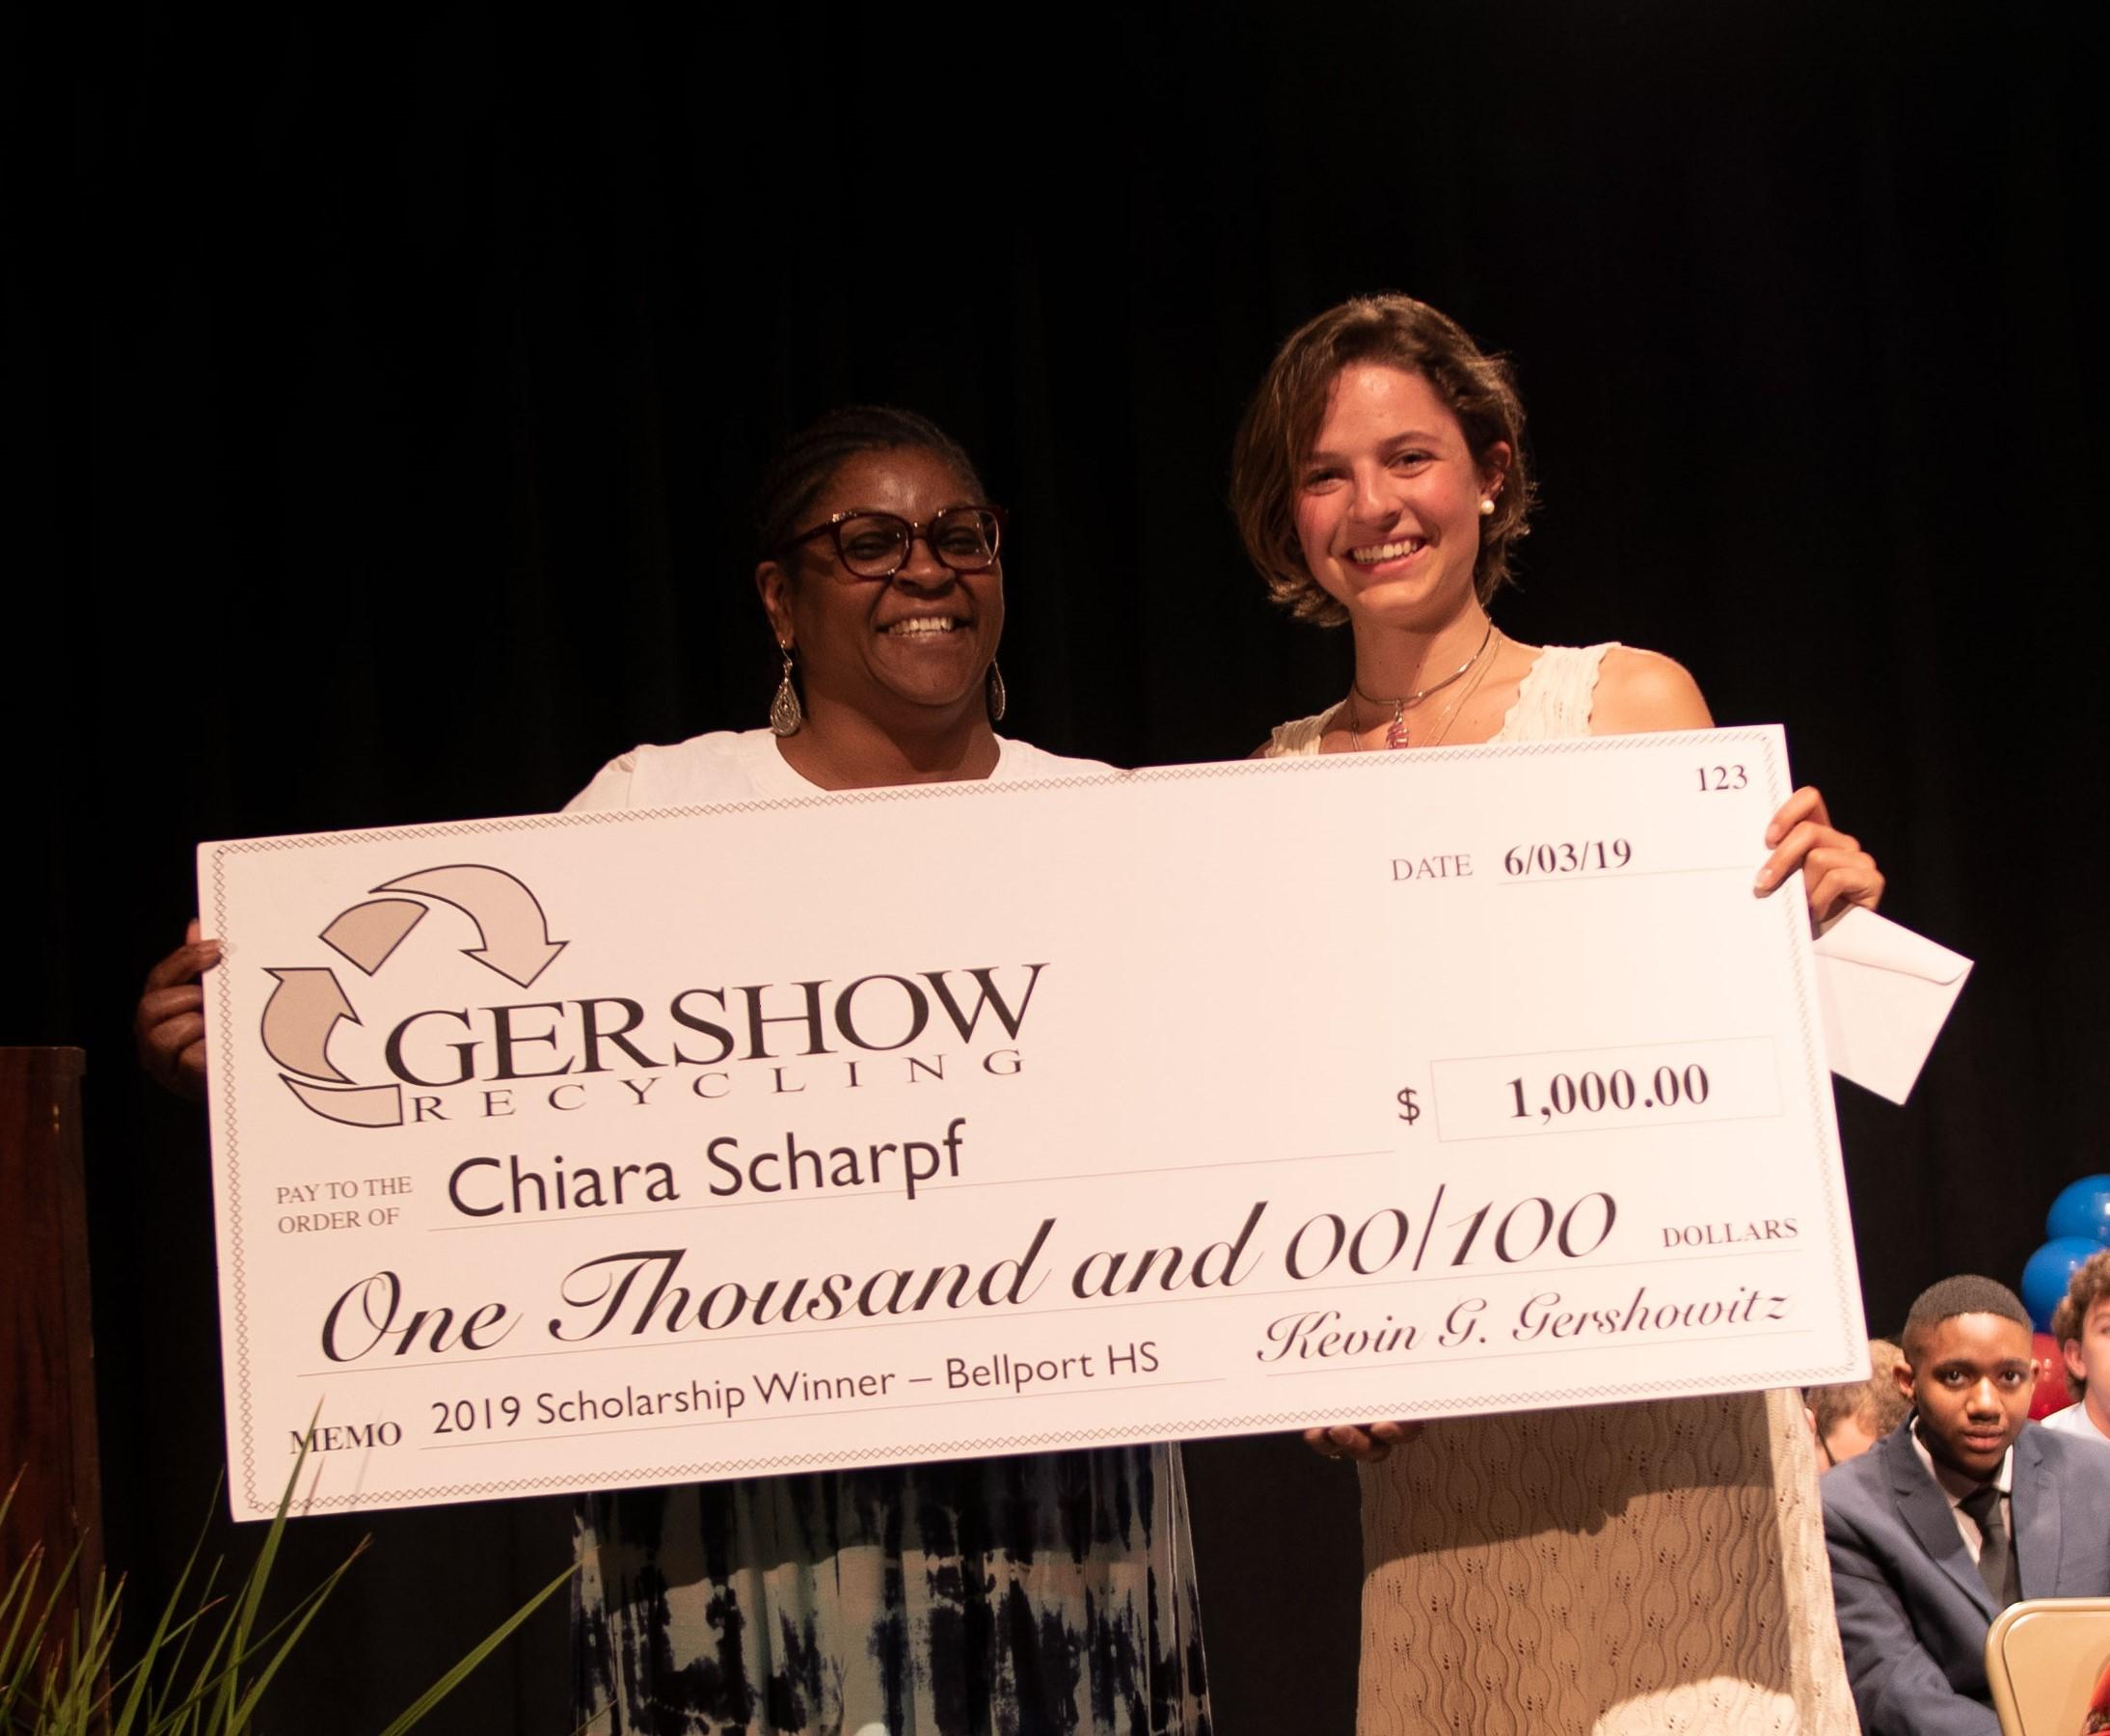 , Gershow Recycling Grants Environmental Conservation Scholarship to Bellport High School Graduating Senior Chiara Scharpf